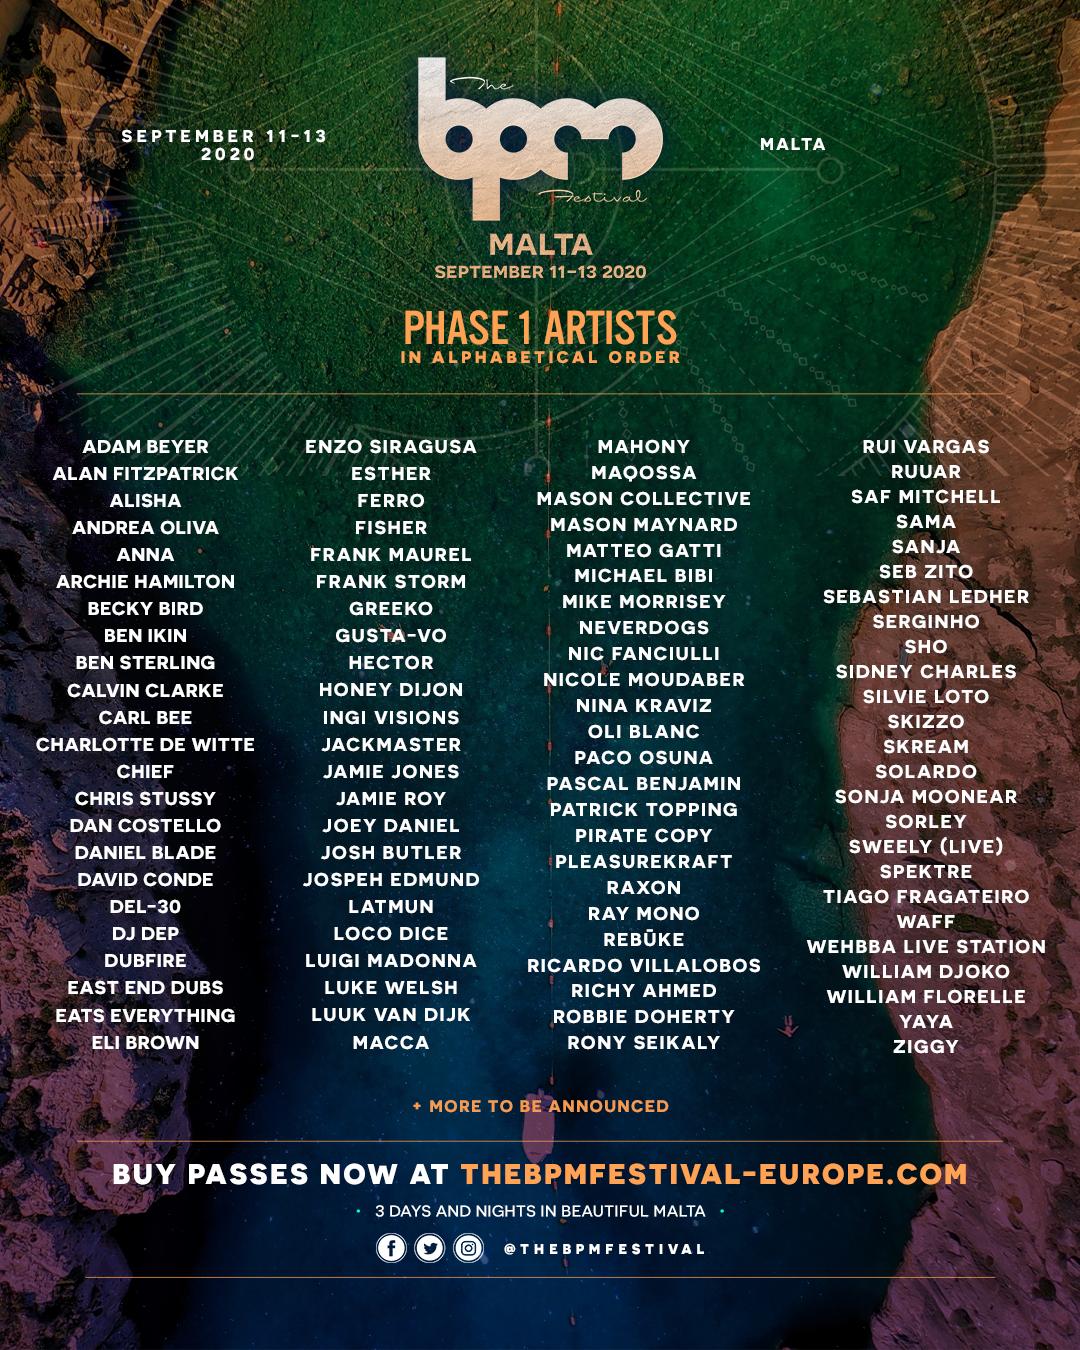 BPM Festival Malta 2020 Lineup